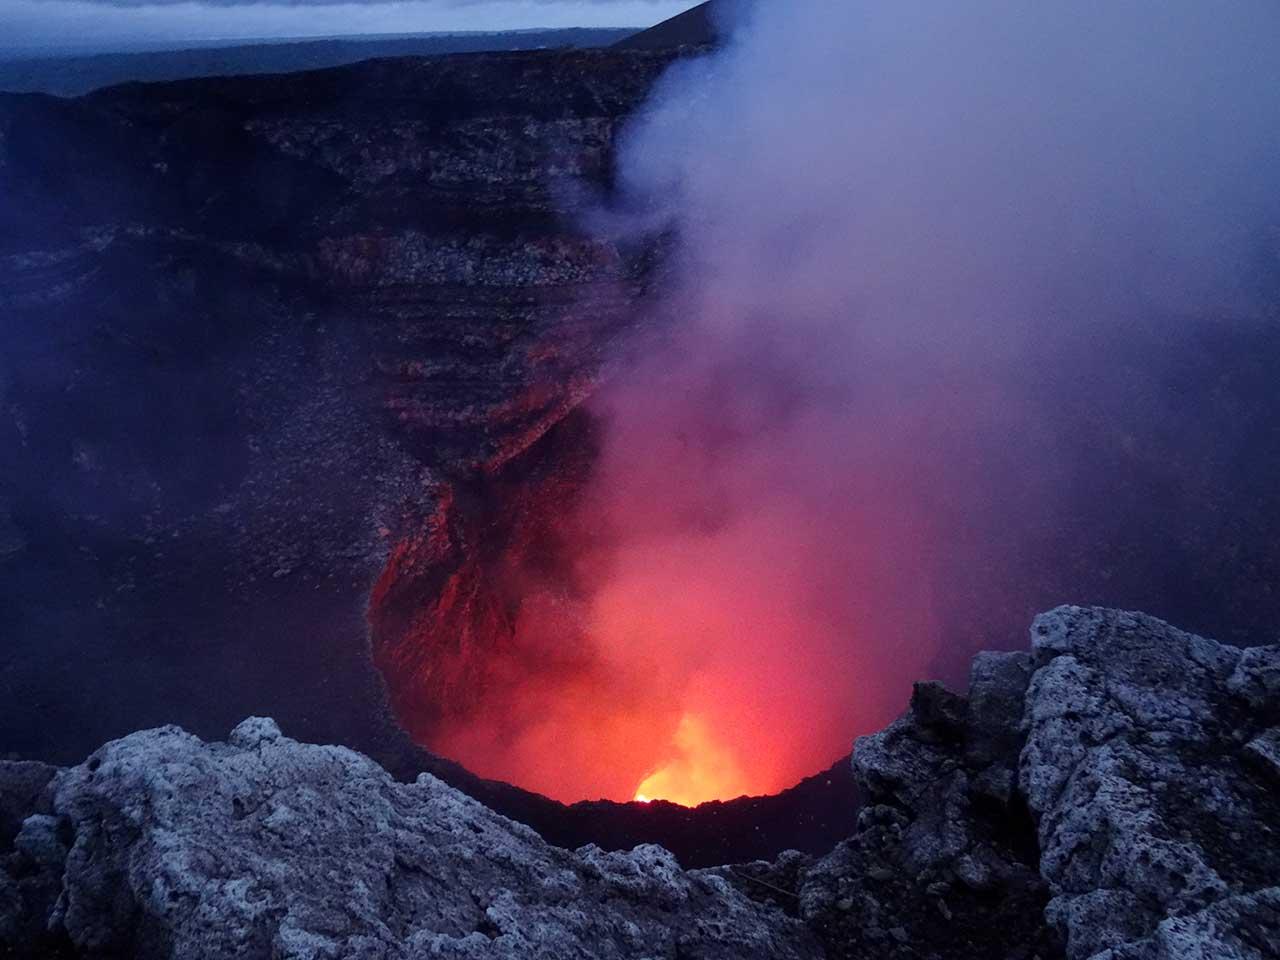 Éruption du volcan Masaya au Nicaragua © Melissa Mlakar / Tangka